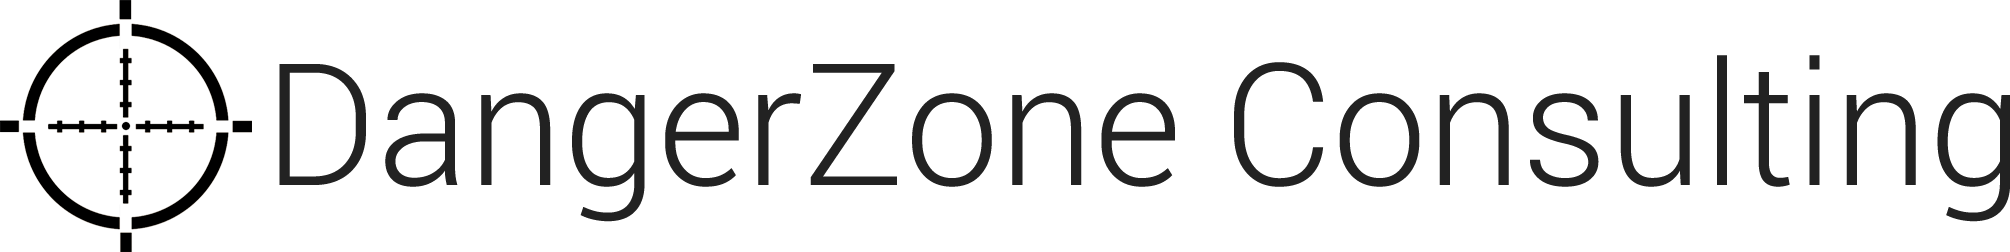 Dangerzone Consulting